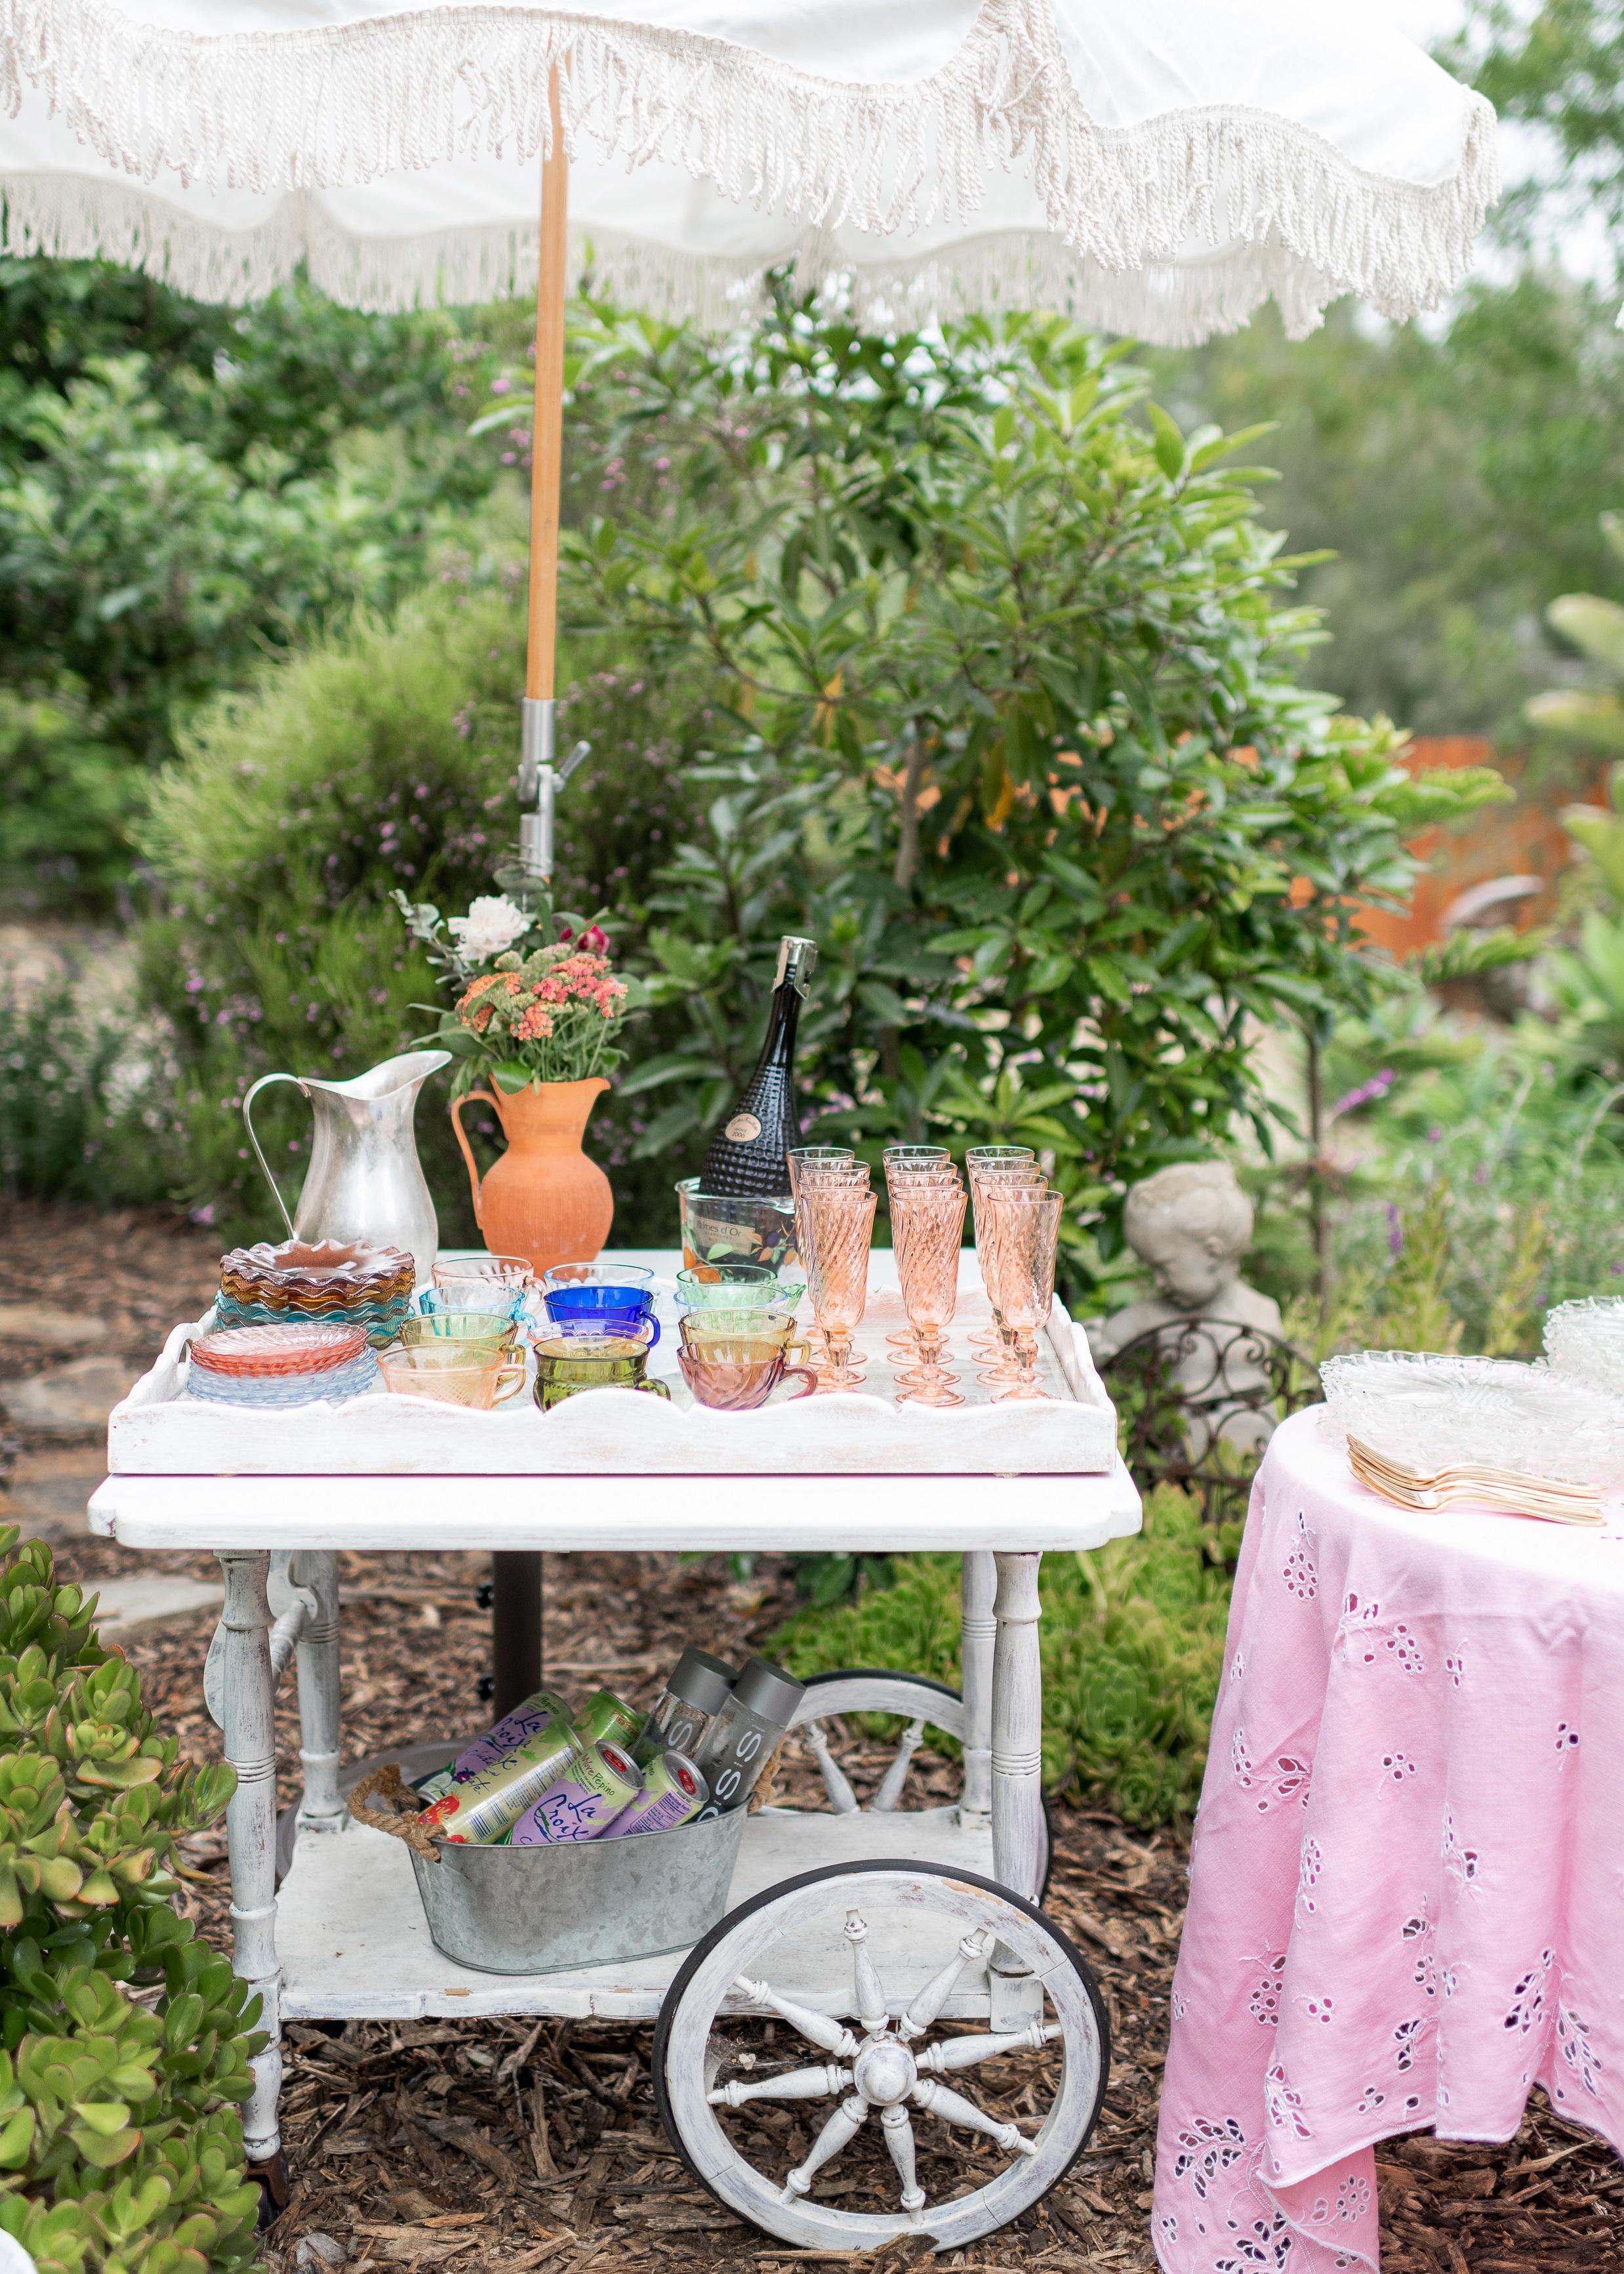 www.santabarbarawedding.com | Willa Kveta Photography | Santa Barbara Classic Weddings | Officiant Event | Drink Cart